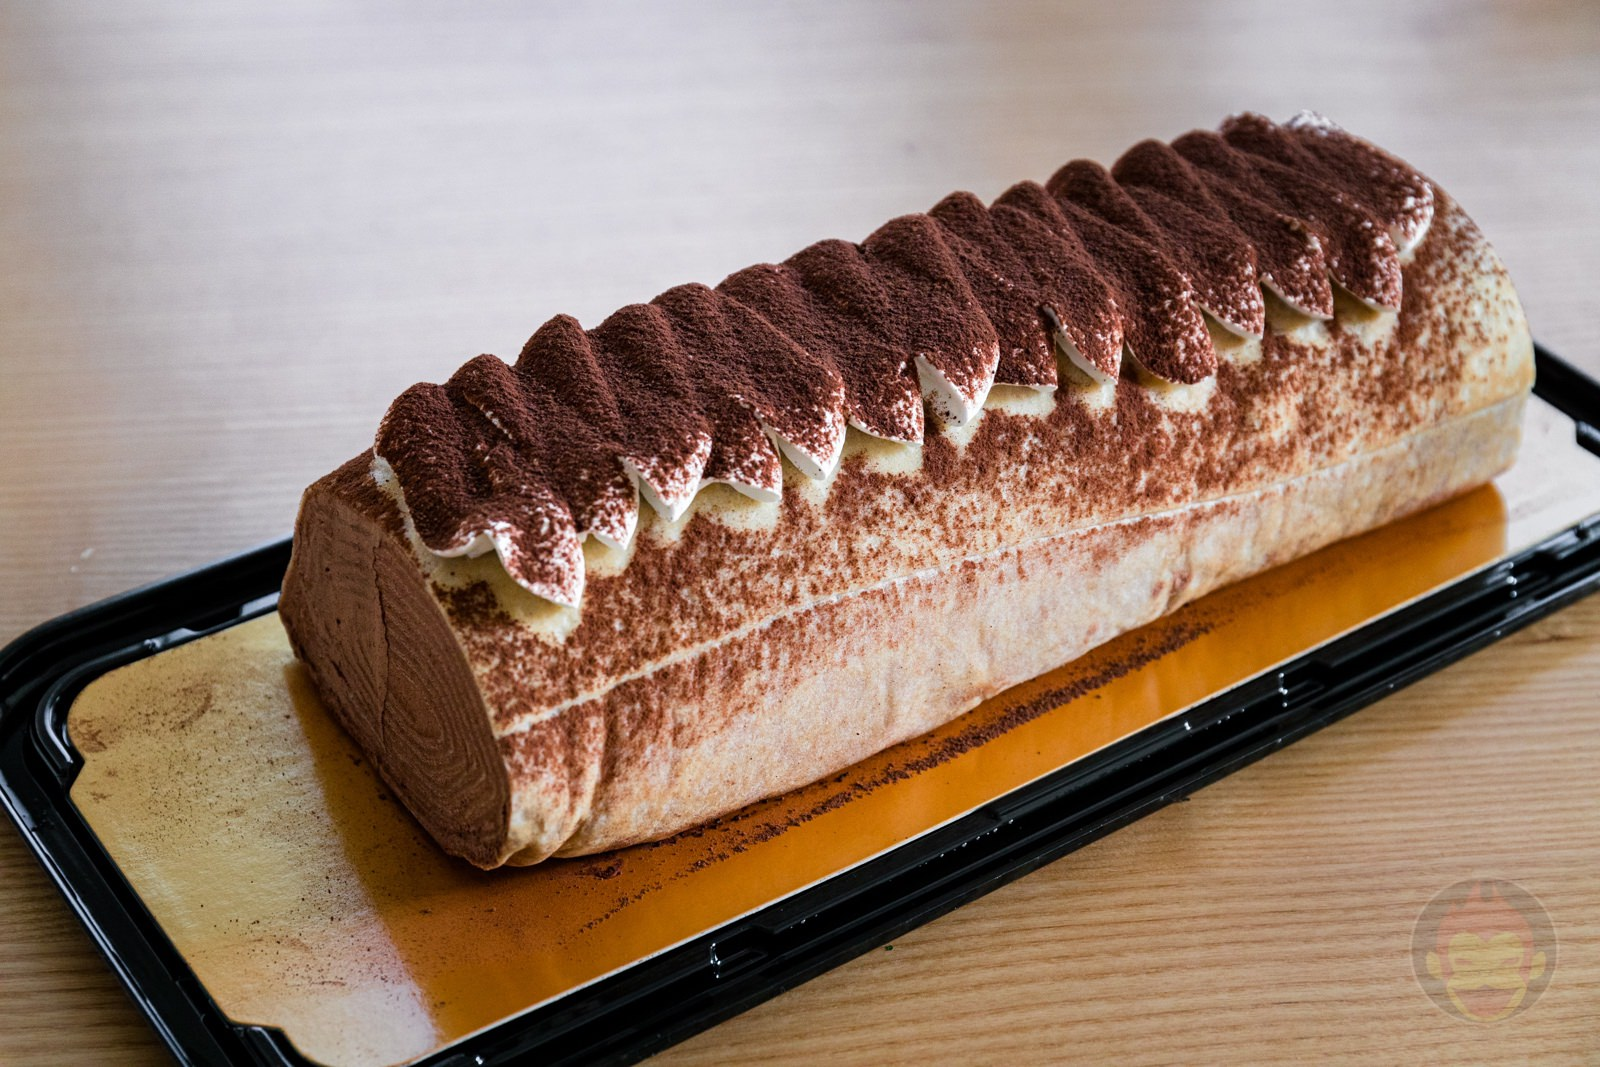 Chocolate Crape Roll Costco Dessert 03